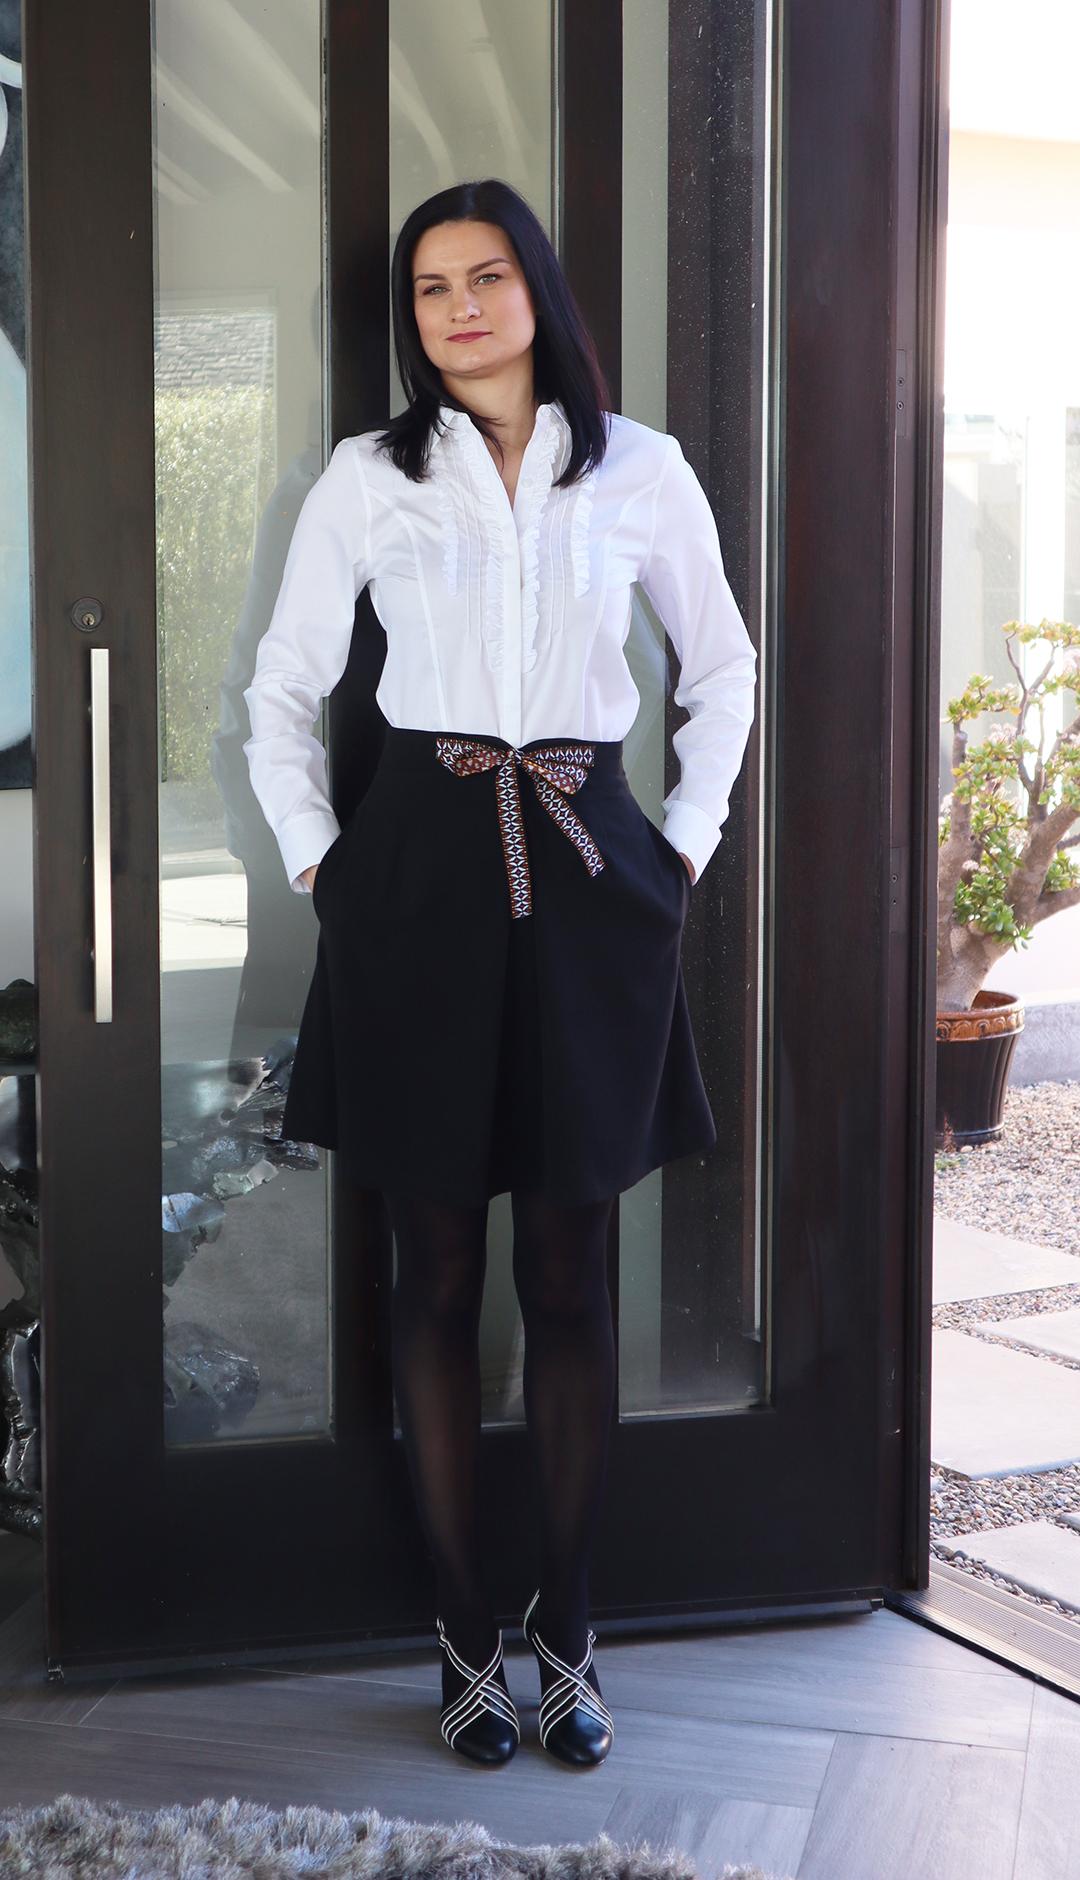 newlook-6642-skirt-sewing-pattern